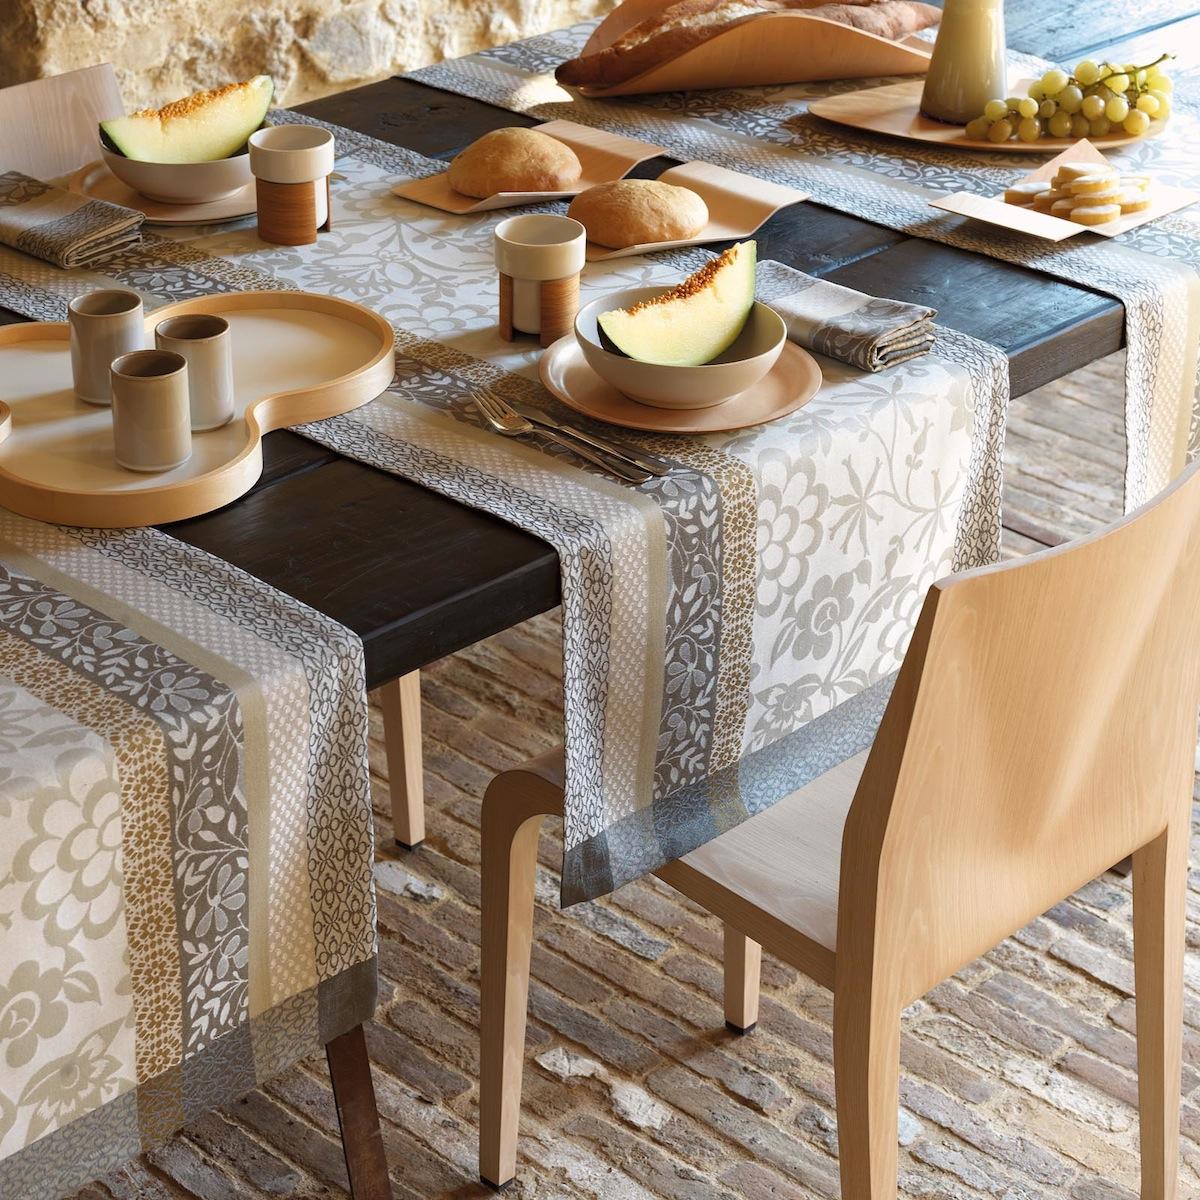 Chemin de table en coton calisson 55 x 200